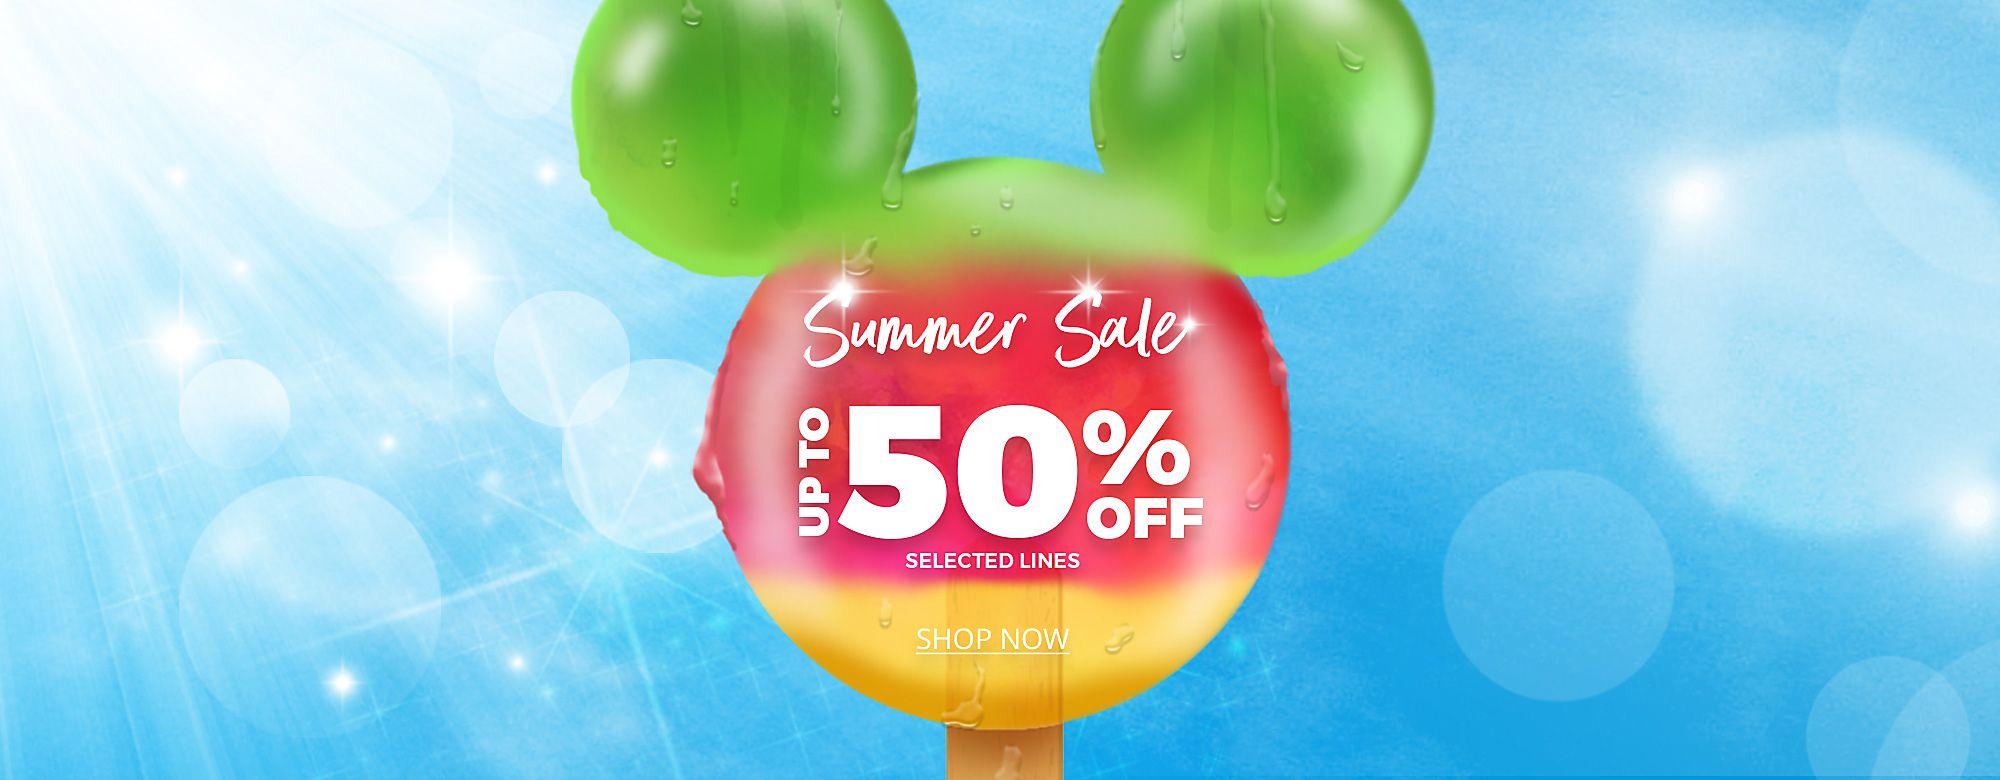 e50fa93f0 shopDisney UK | Home to Official Disney Merchandise